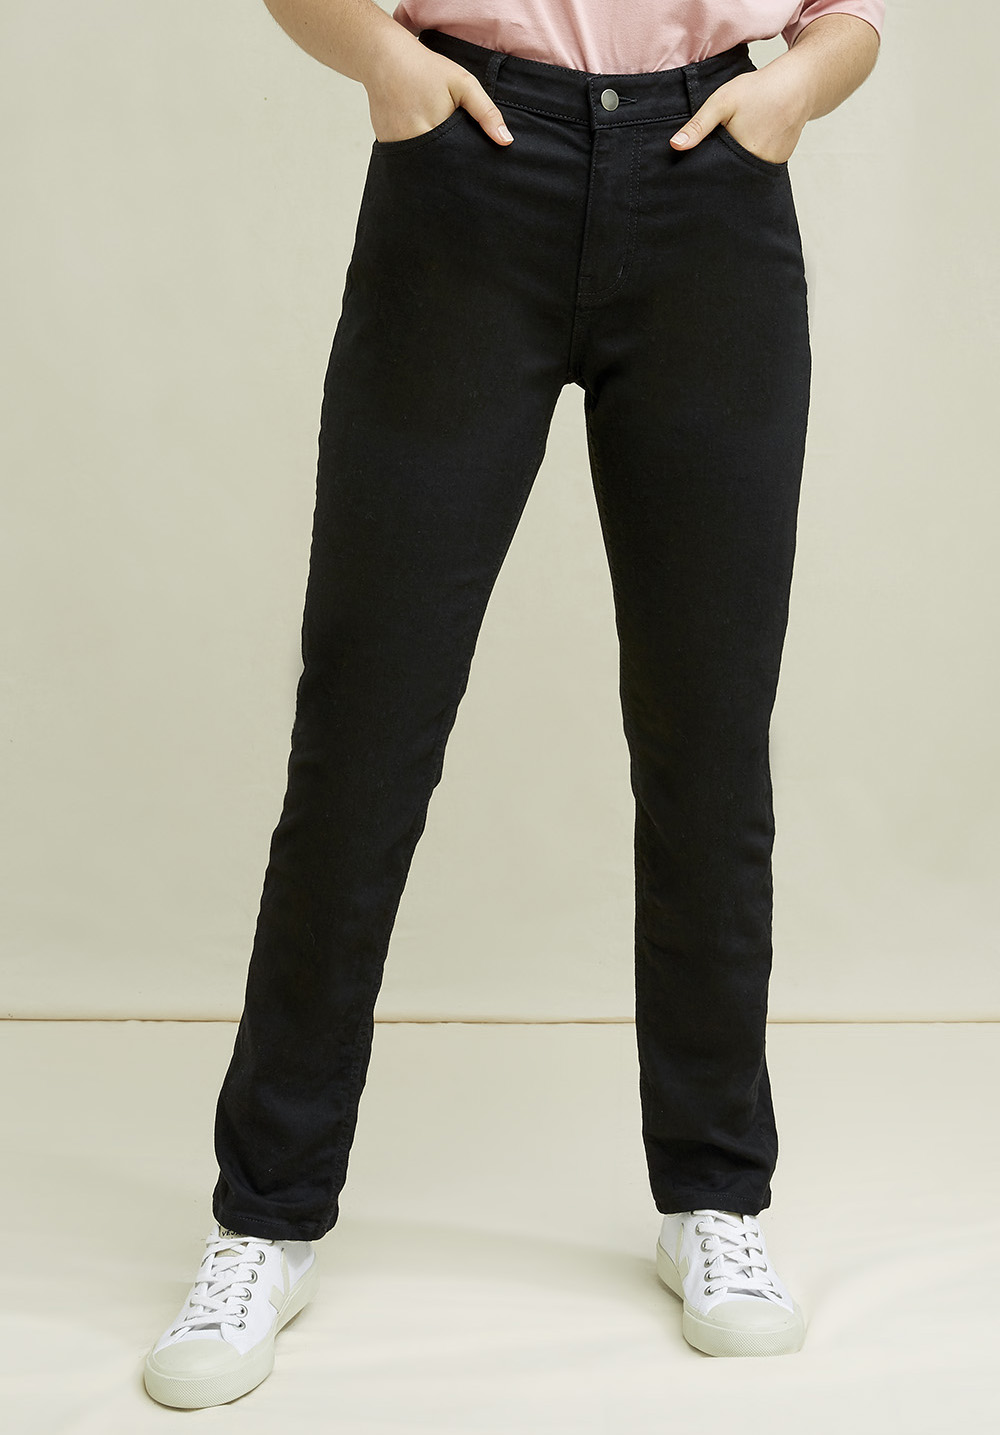 Heather Slim Fit Jeans In Black